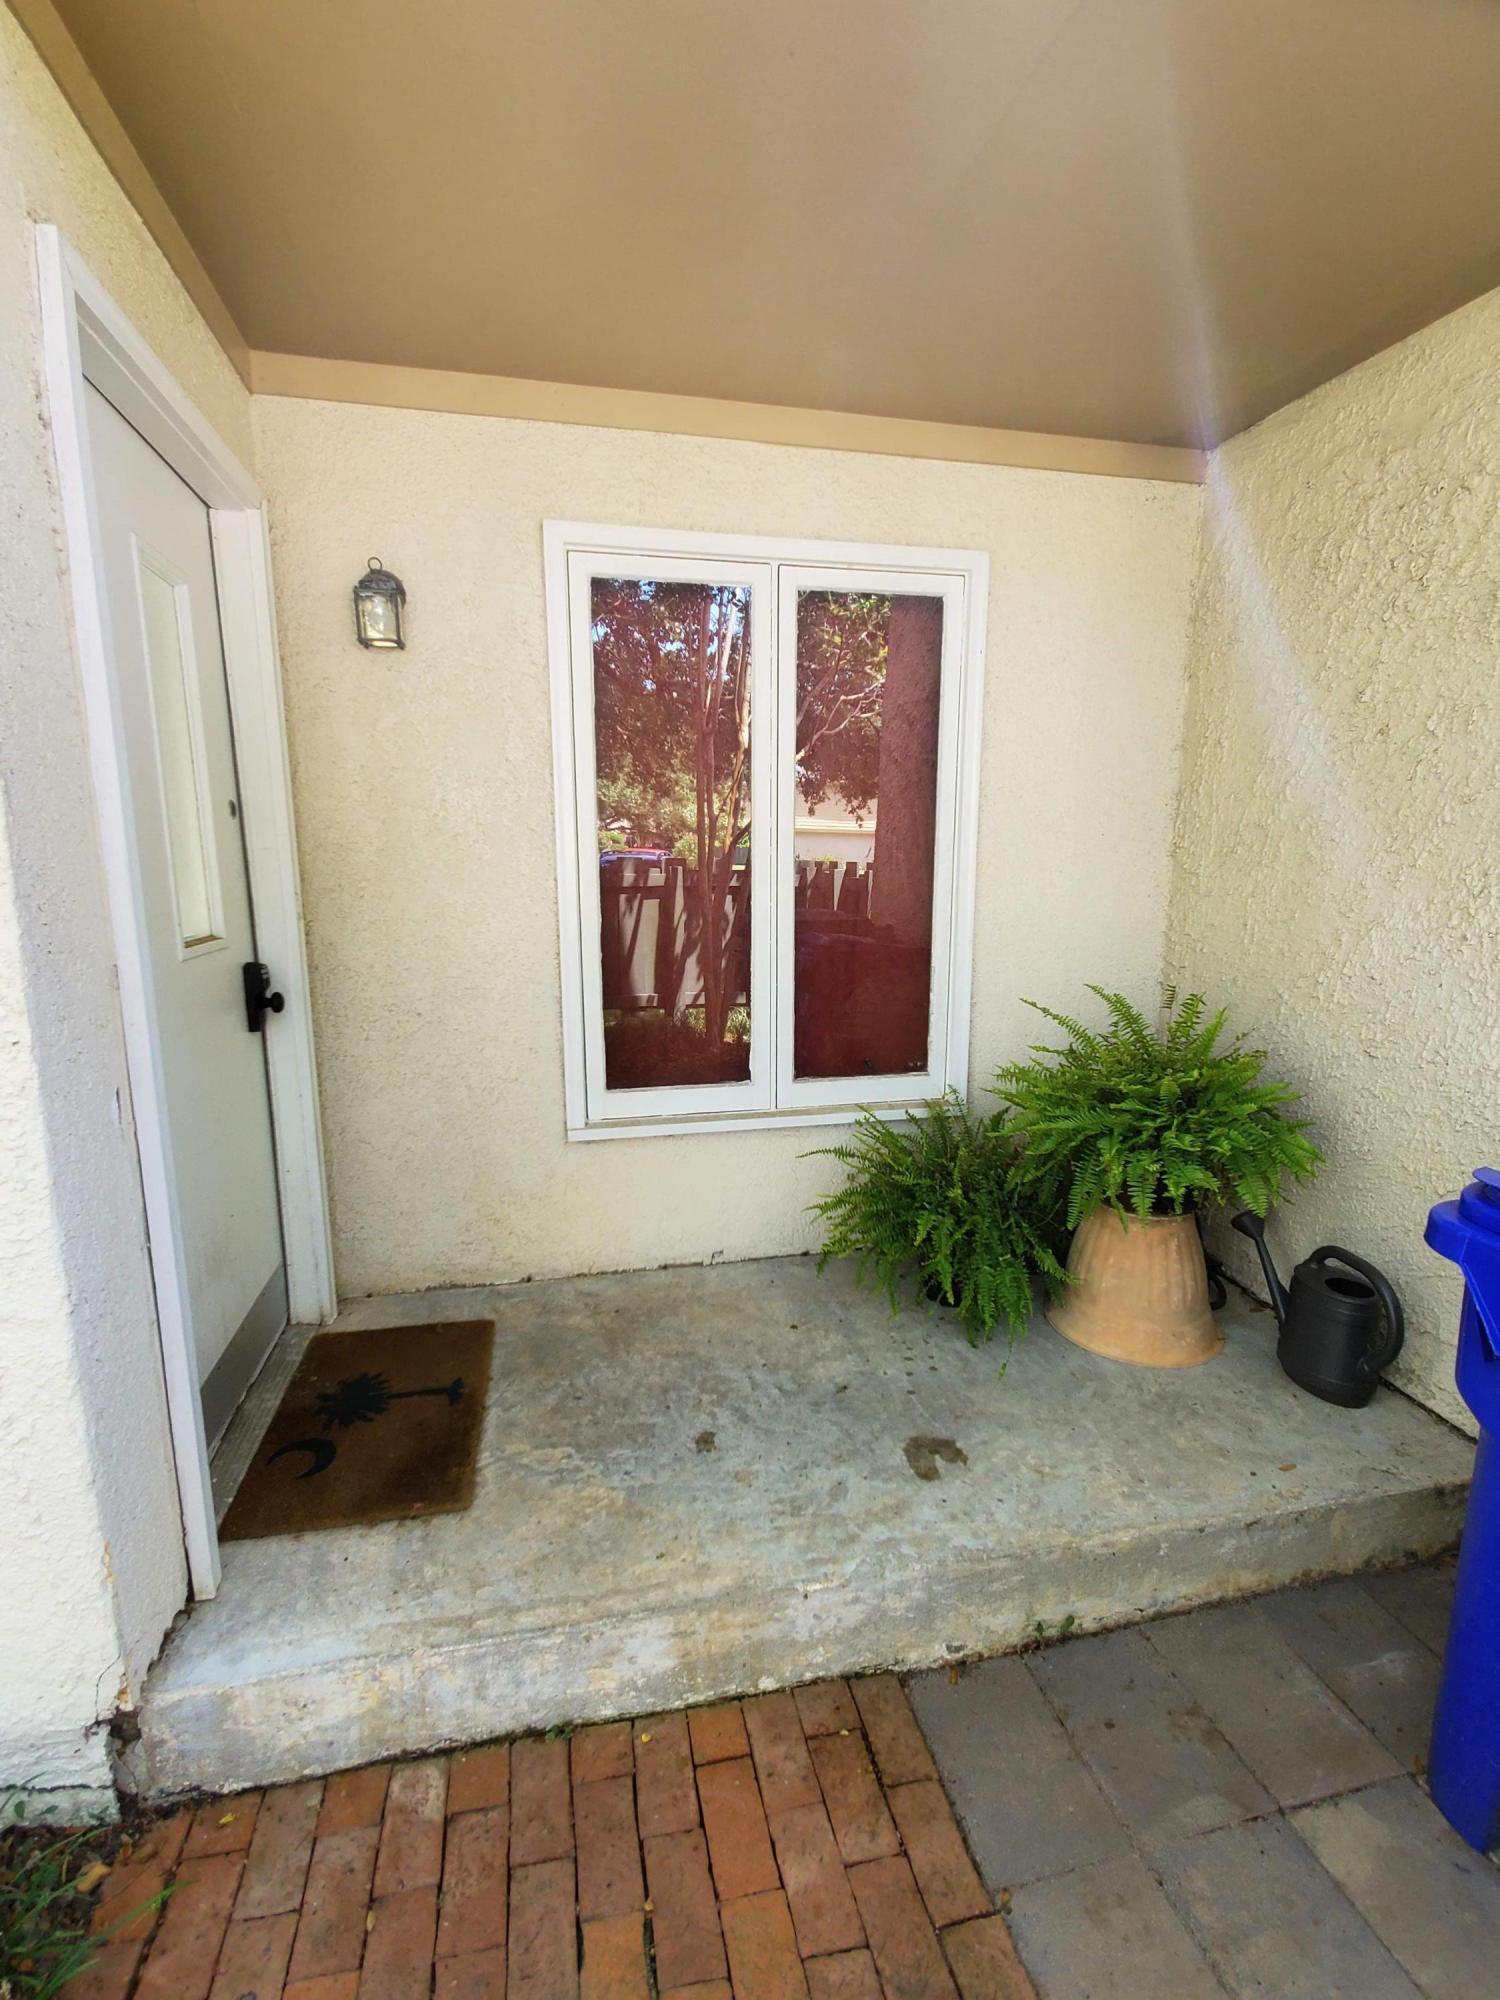 Snee Farm Homes For Sale - 105 Ventura, Mount Pleasant, SC - 26